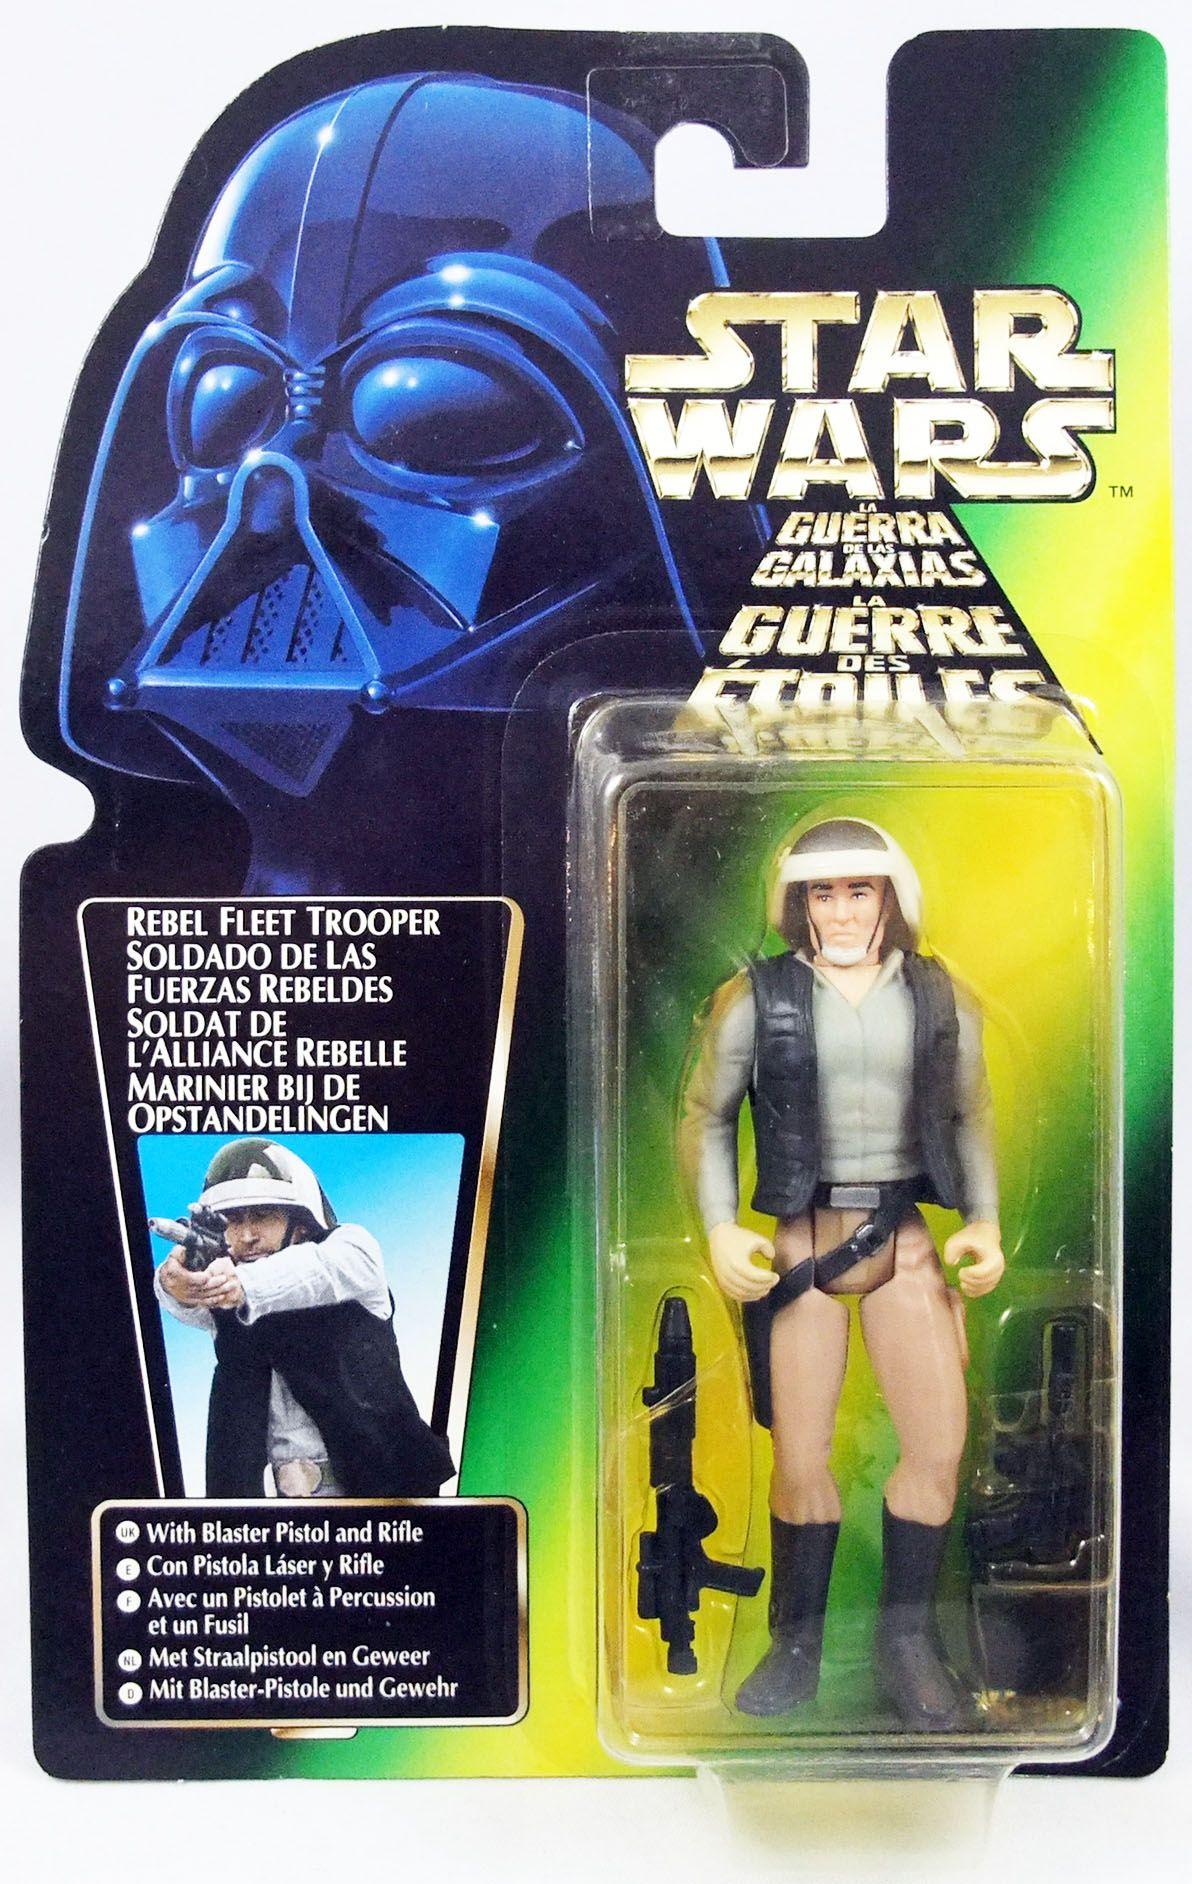 Star Wars (The Power of the Force) - Kenner - Rebel Fleet Trooper